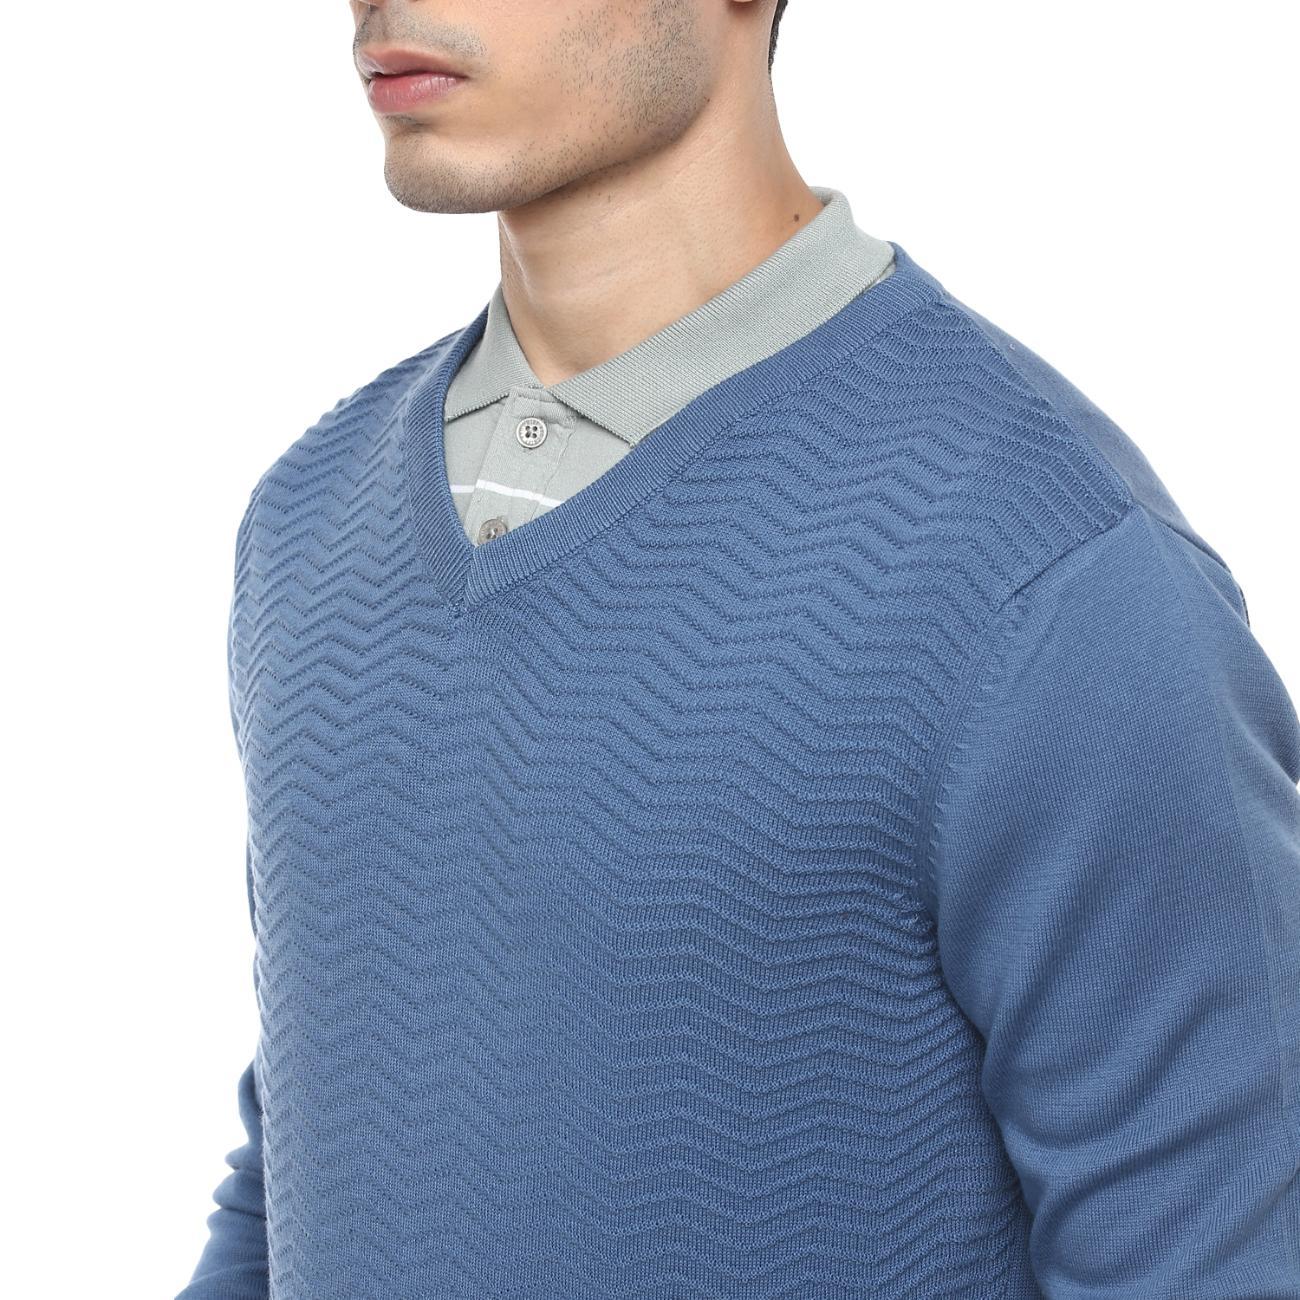 Buy Blue Casual Sweater V-neck for Men